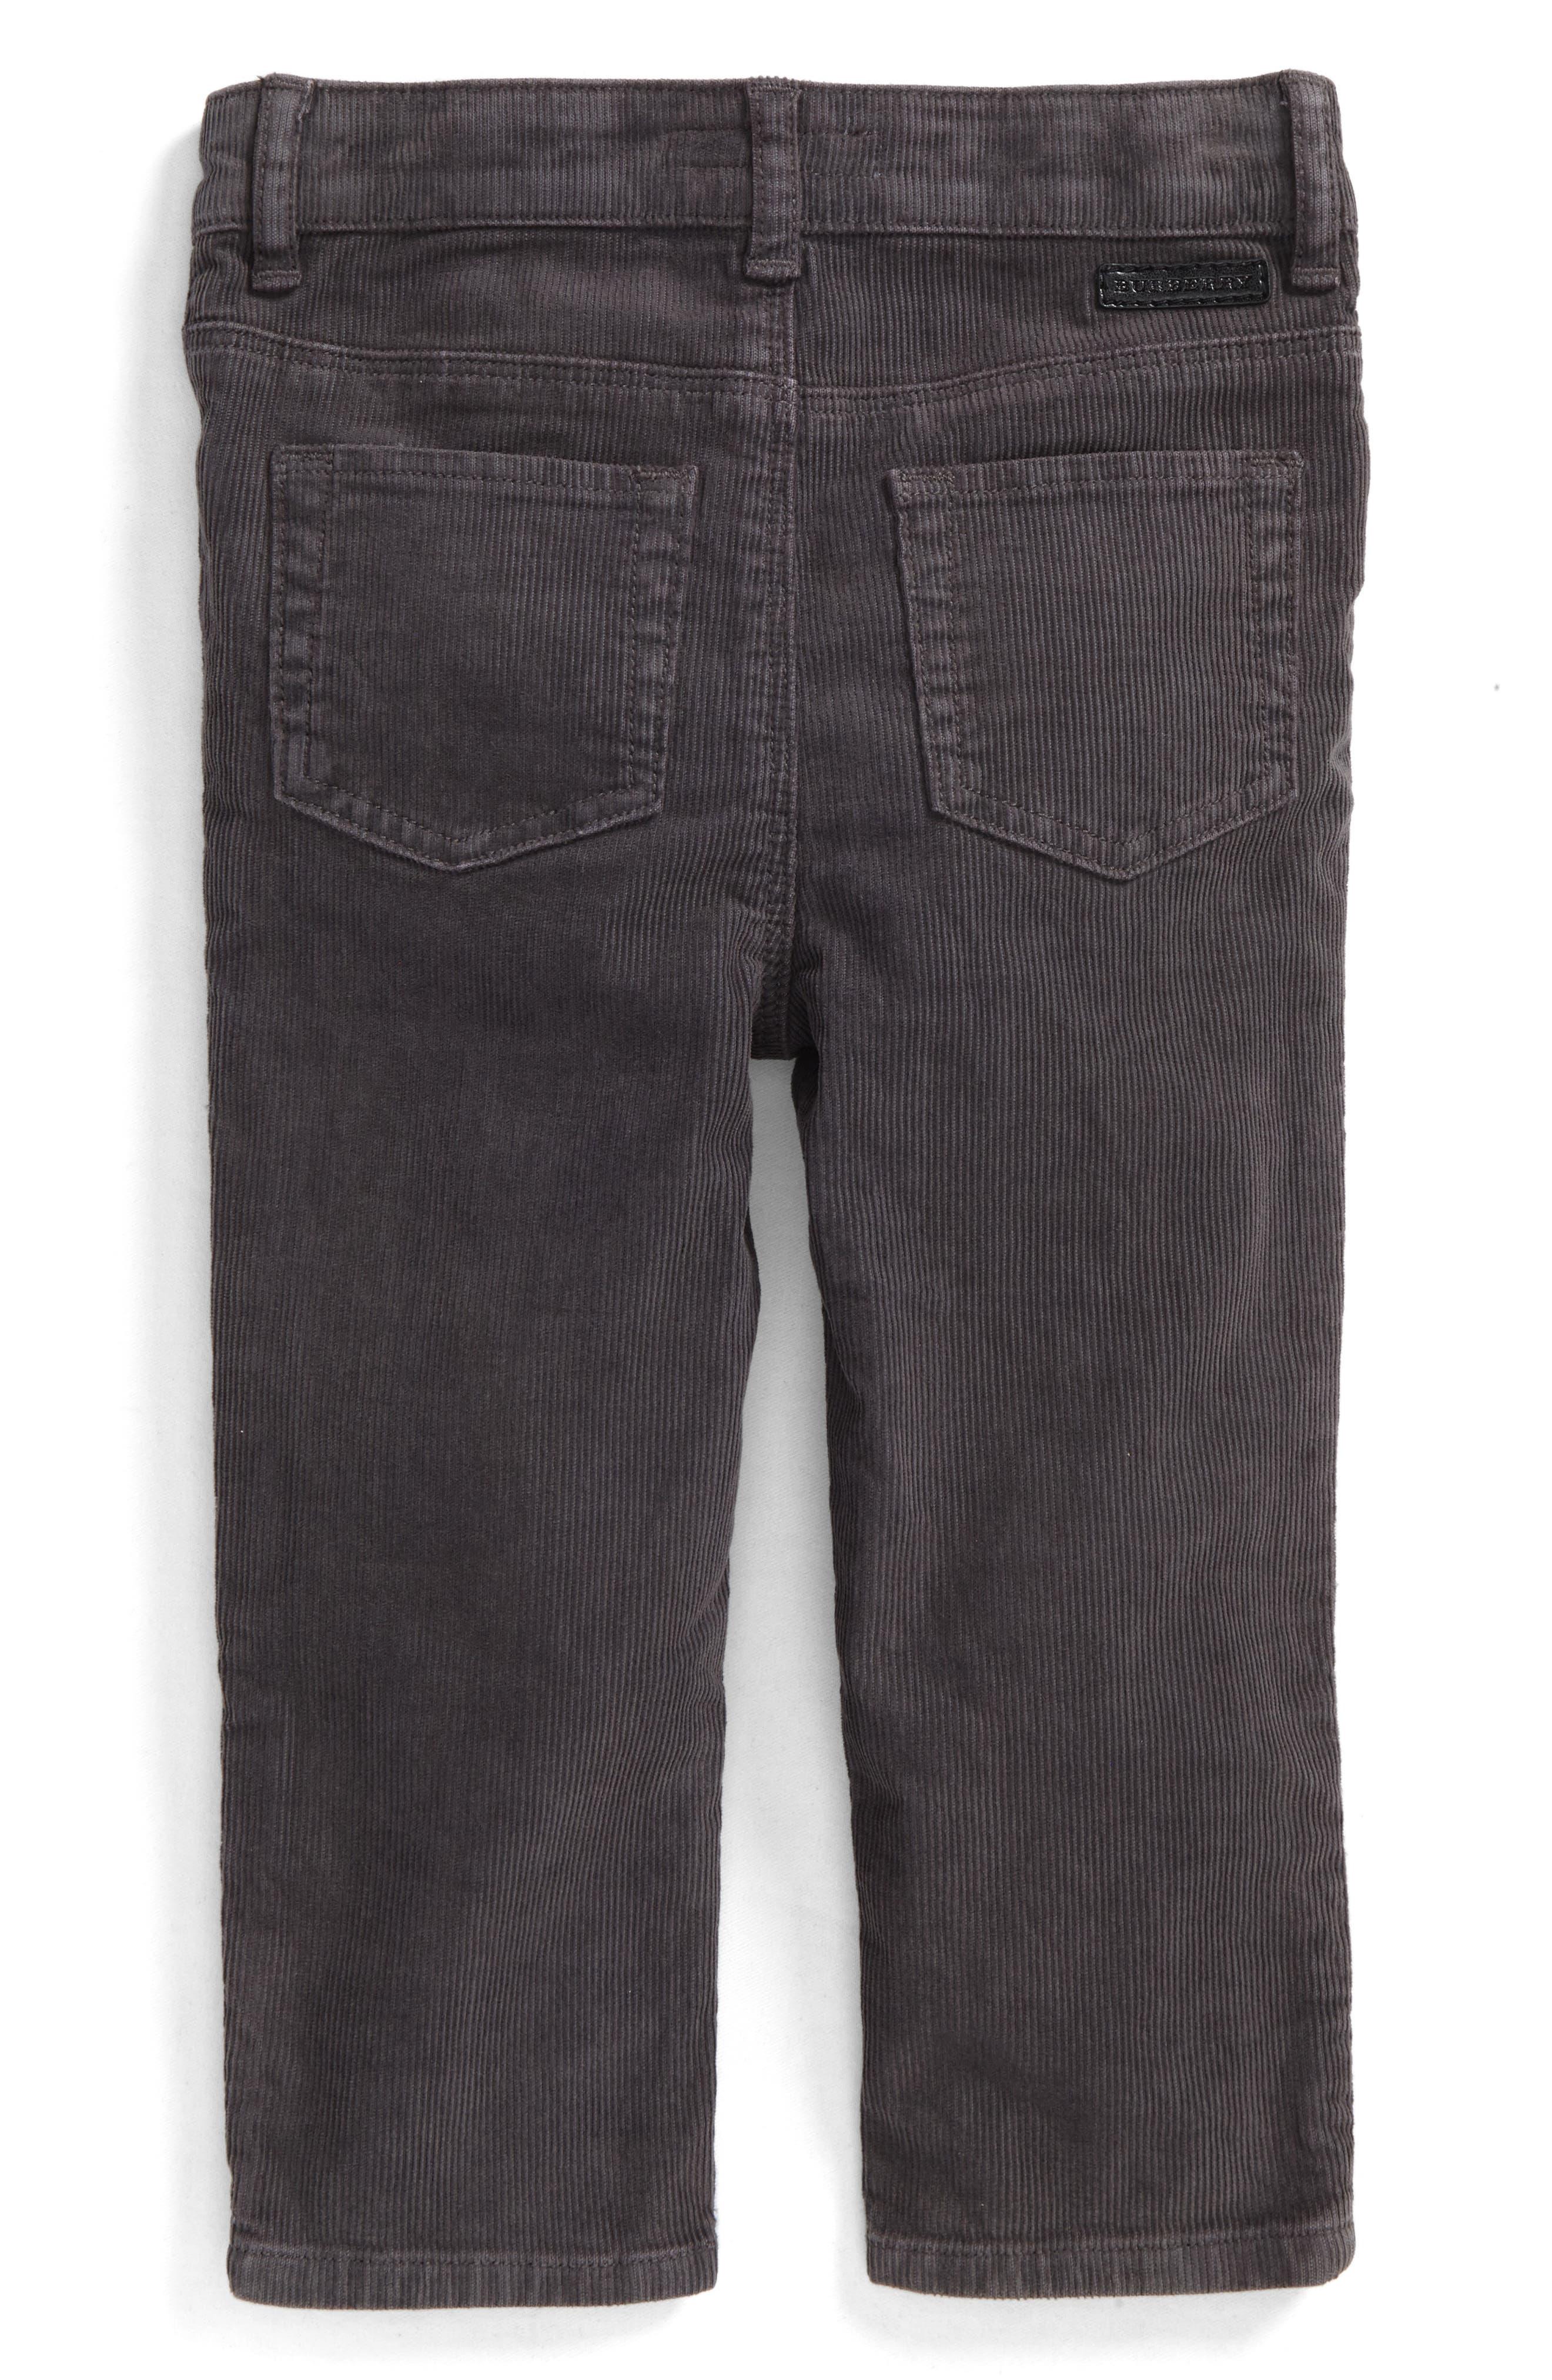 Langston Corduroy Skinny Pants,                             Alternate thumbnail 2, color,                             029